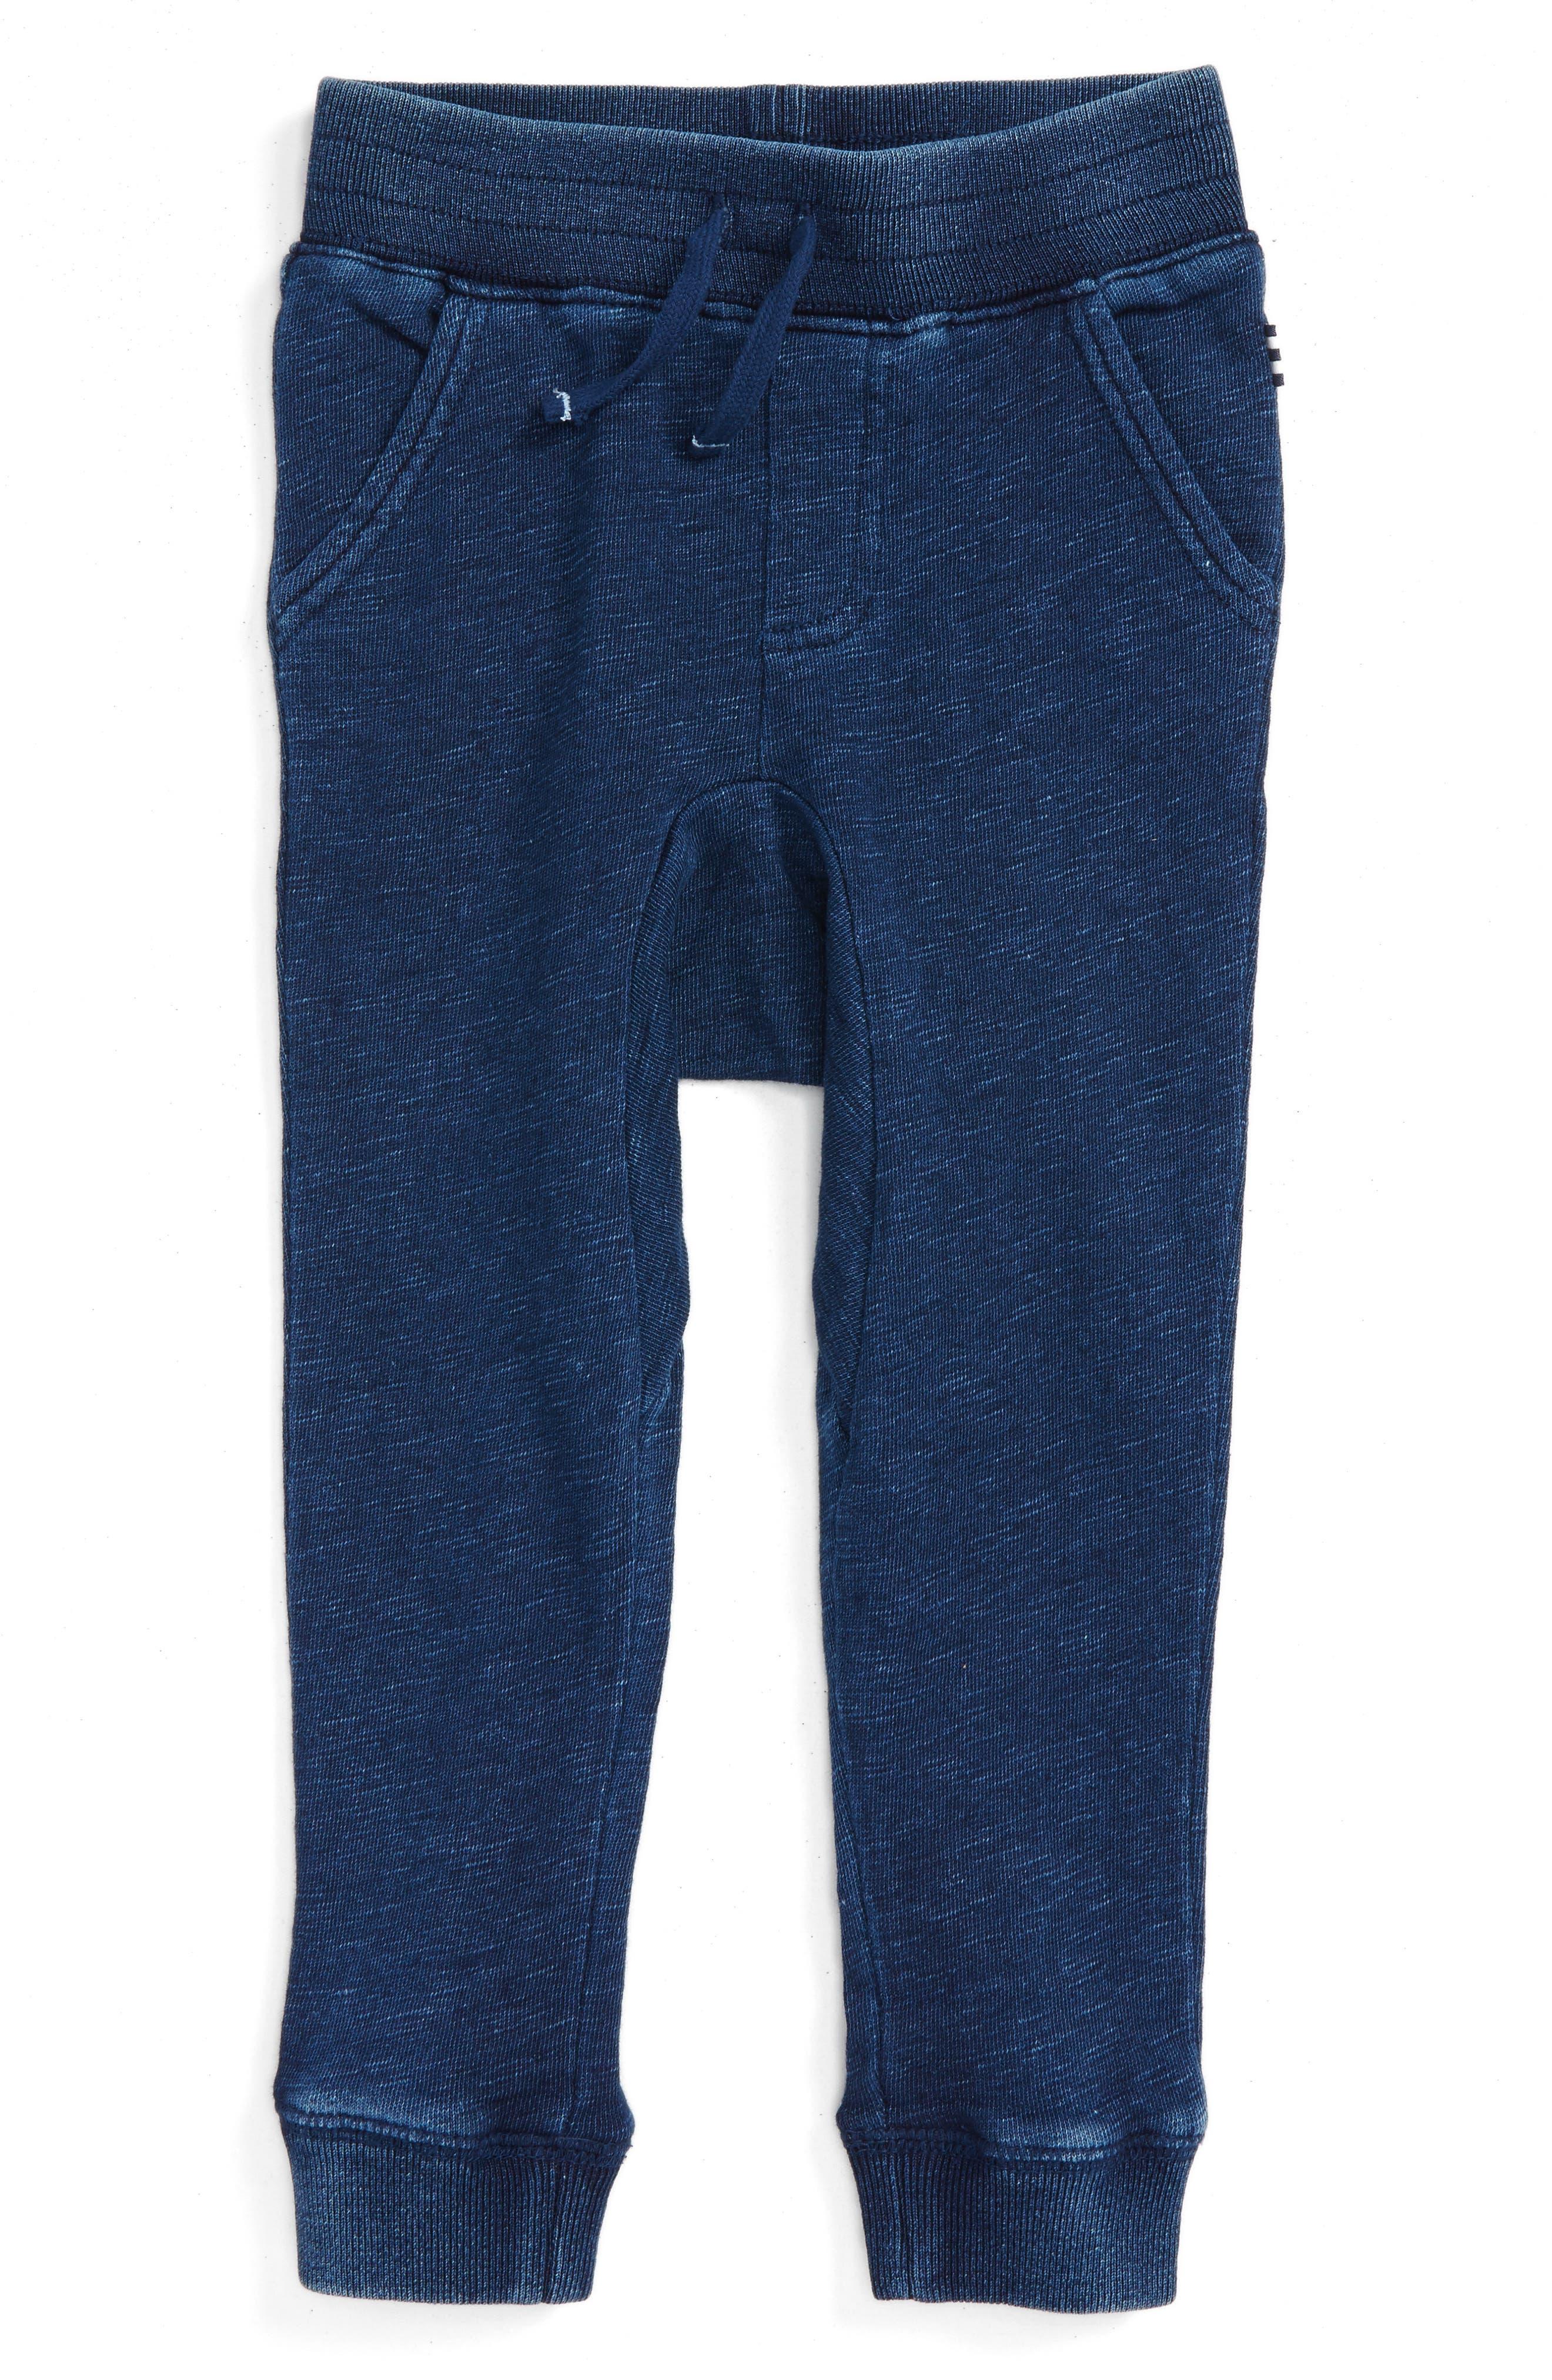 Double Knit Jogger Pants,                             Main thumbnail 1, color,                             400